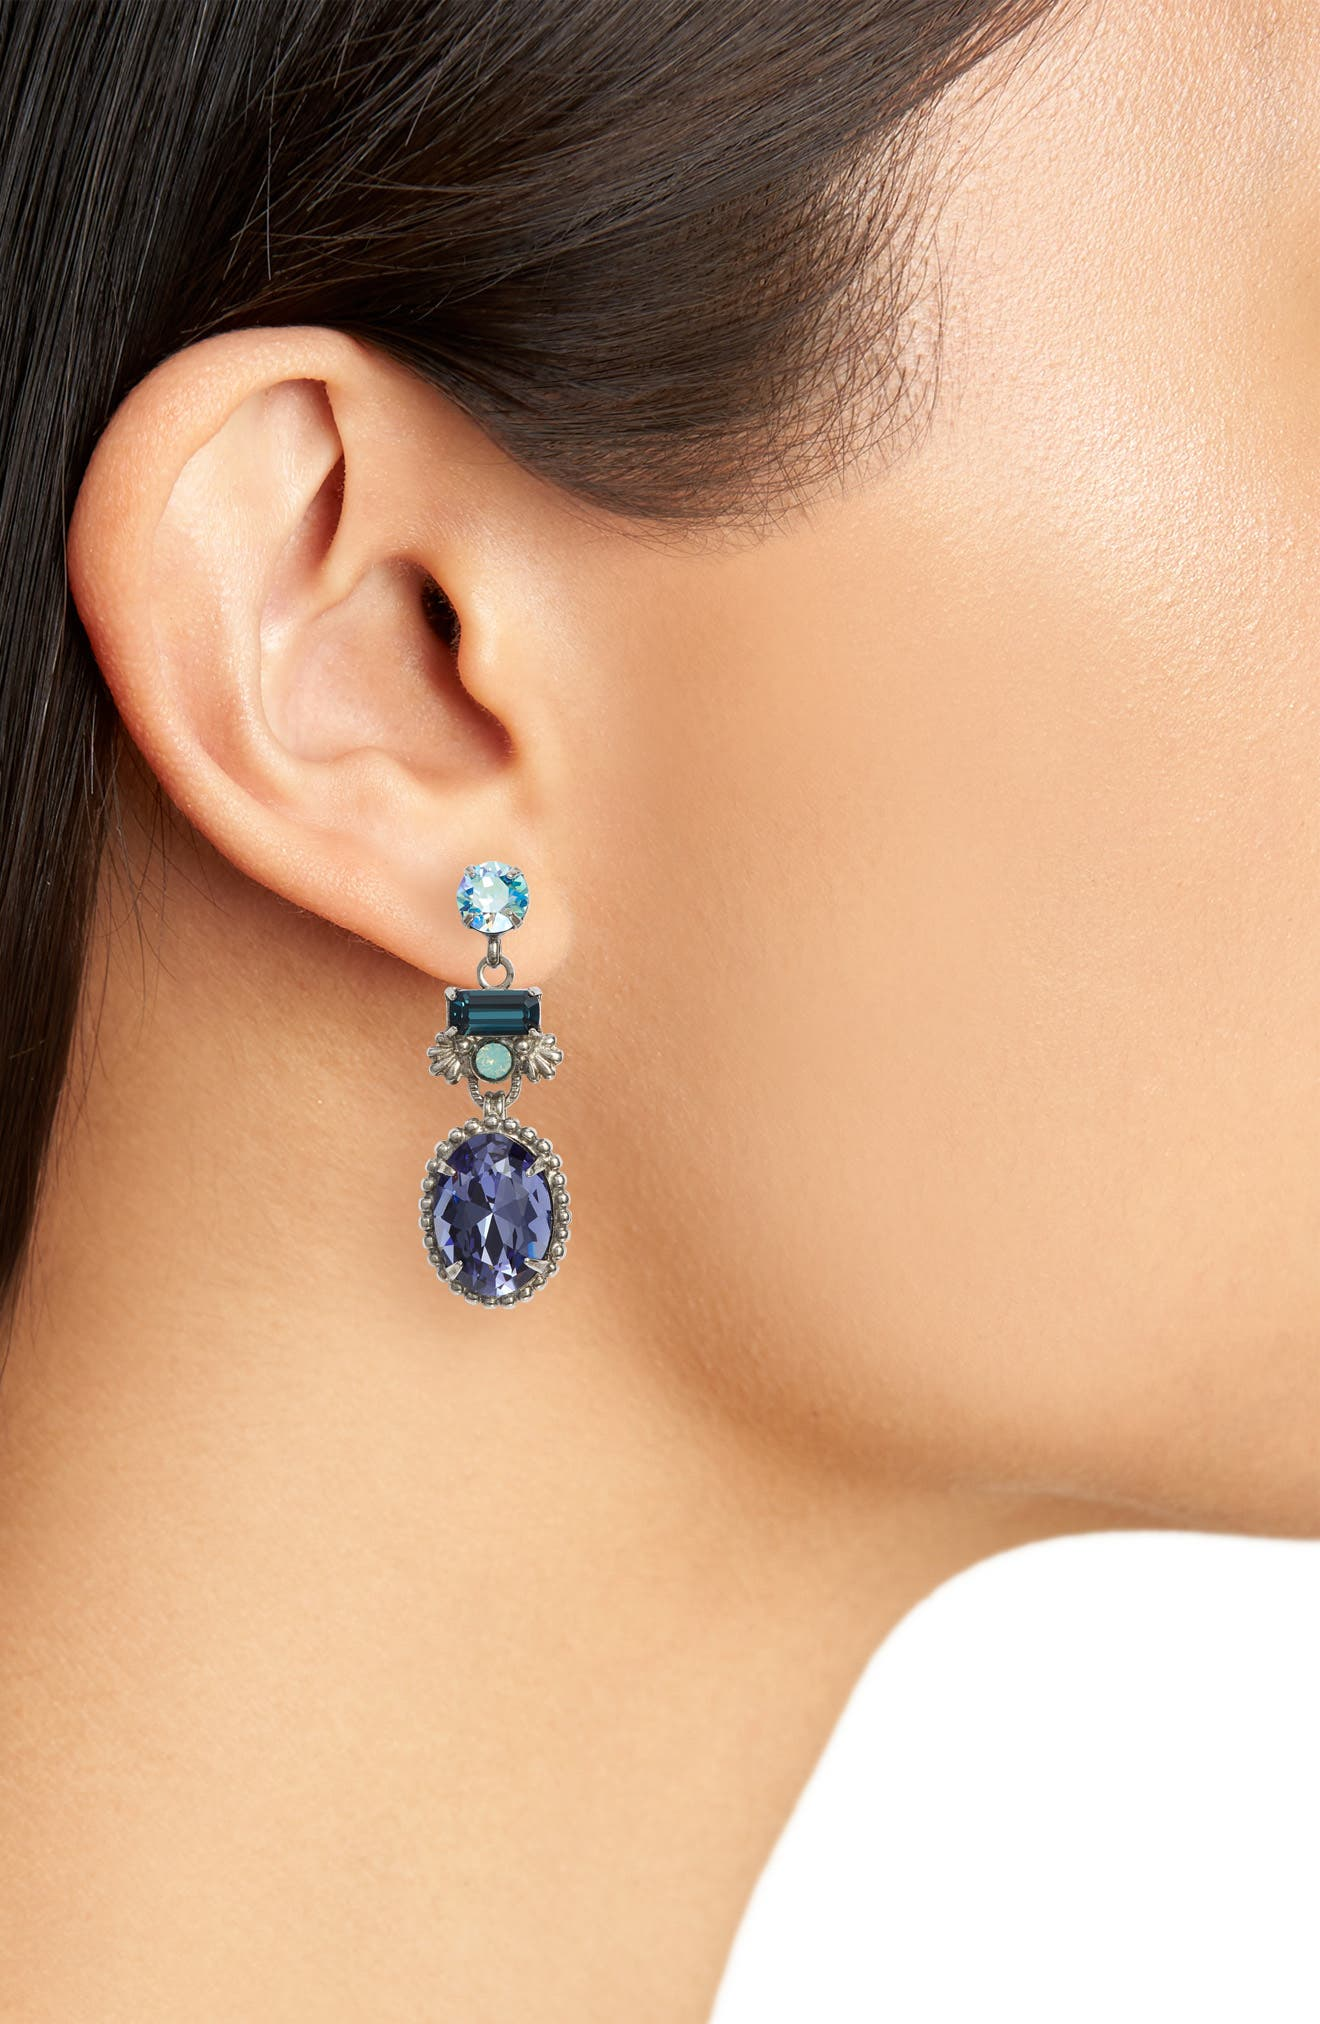 Bergenia Crystal Drop Earrings,                             Alternate thumbnail 2, color,                             PURPLE/ BLUE